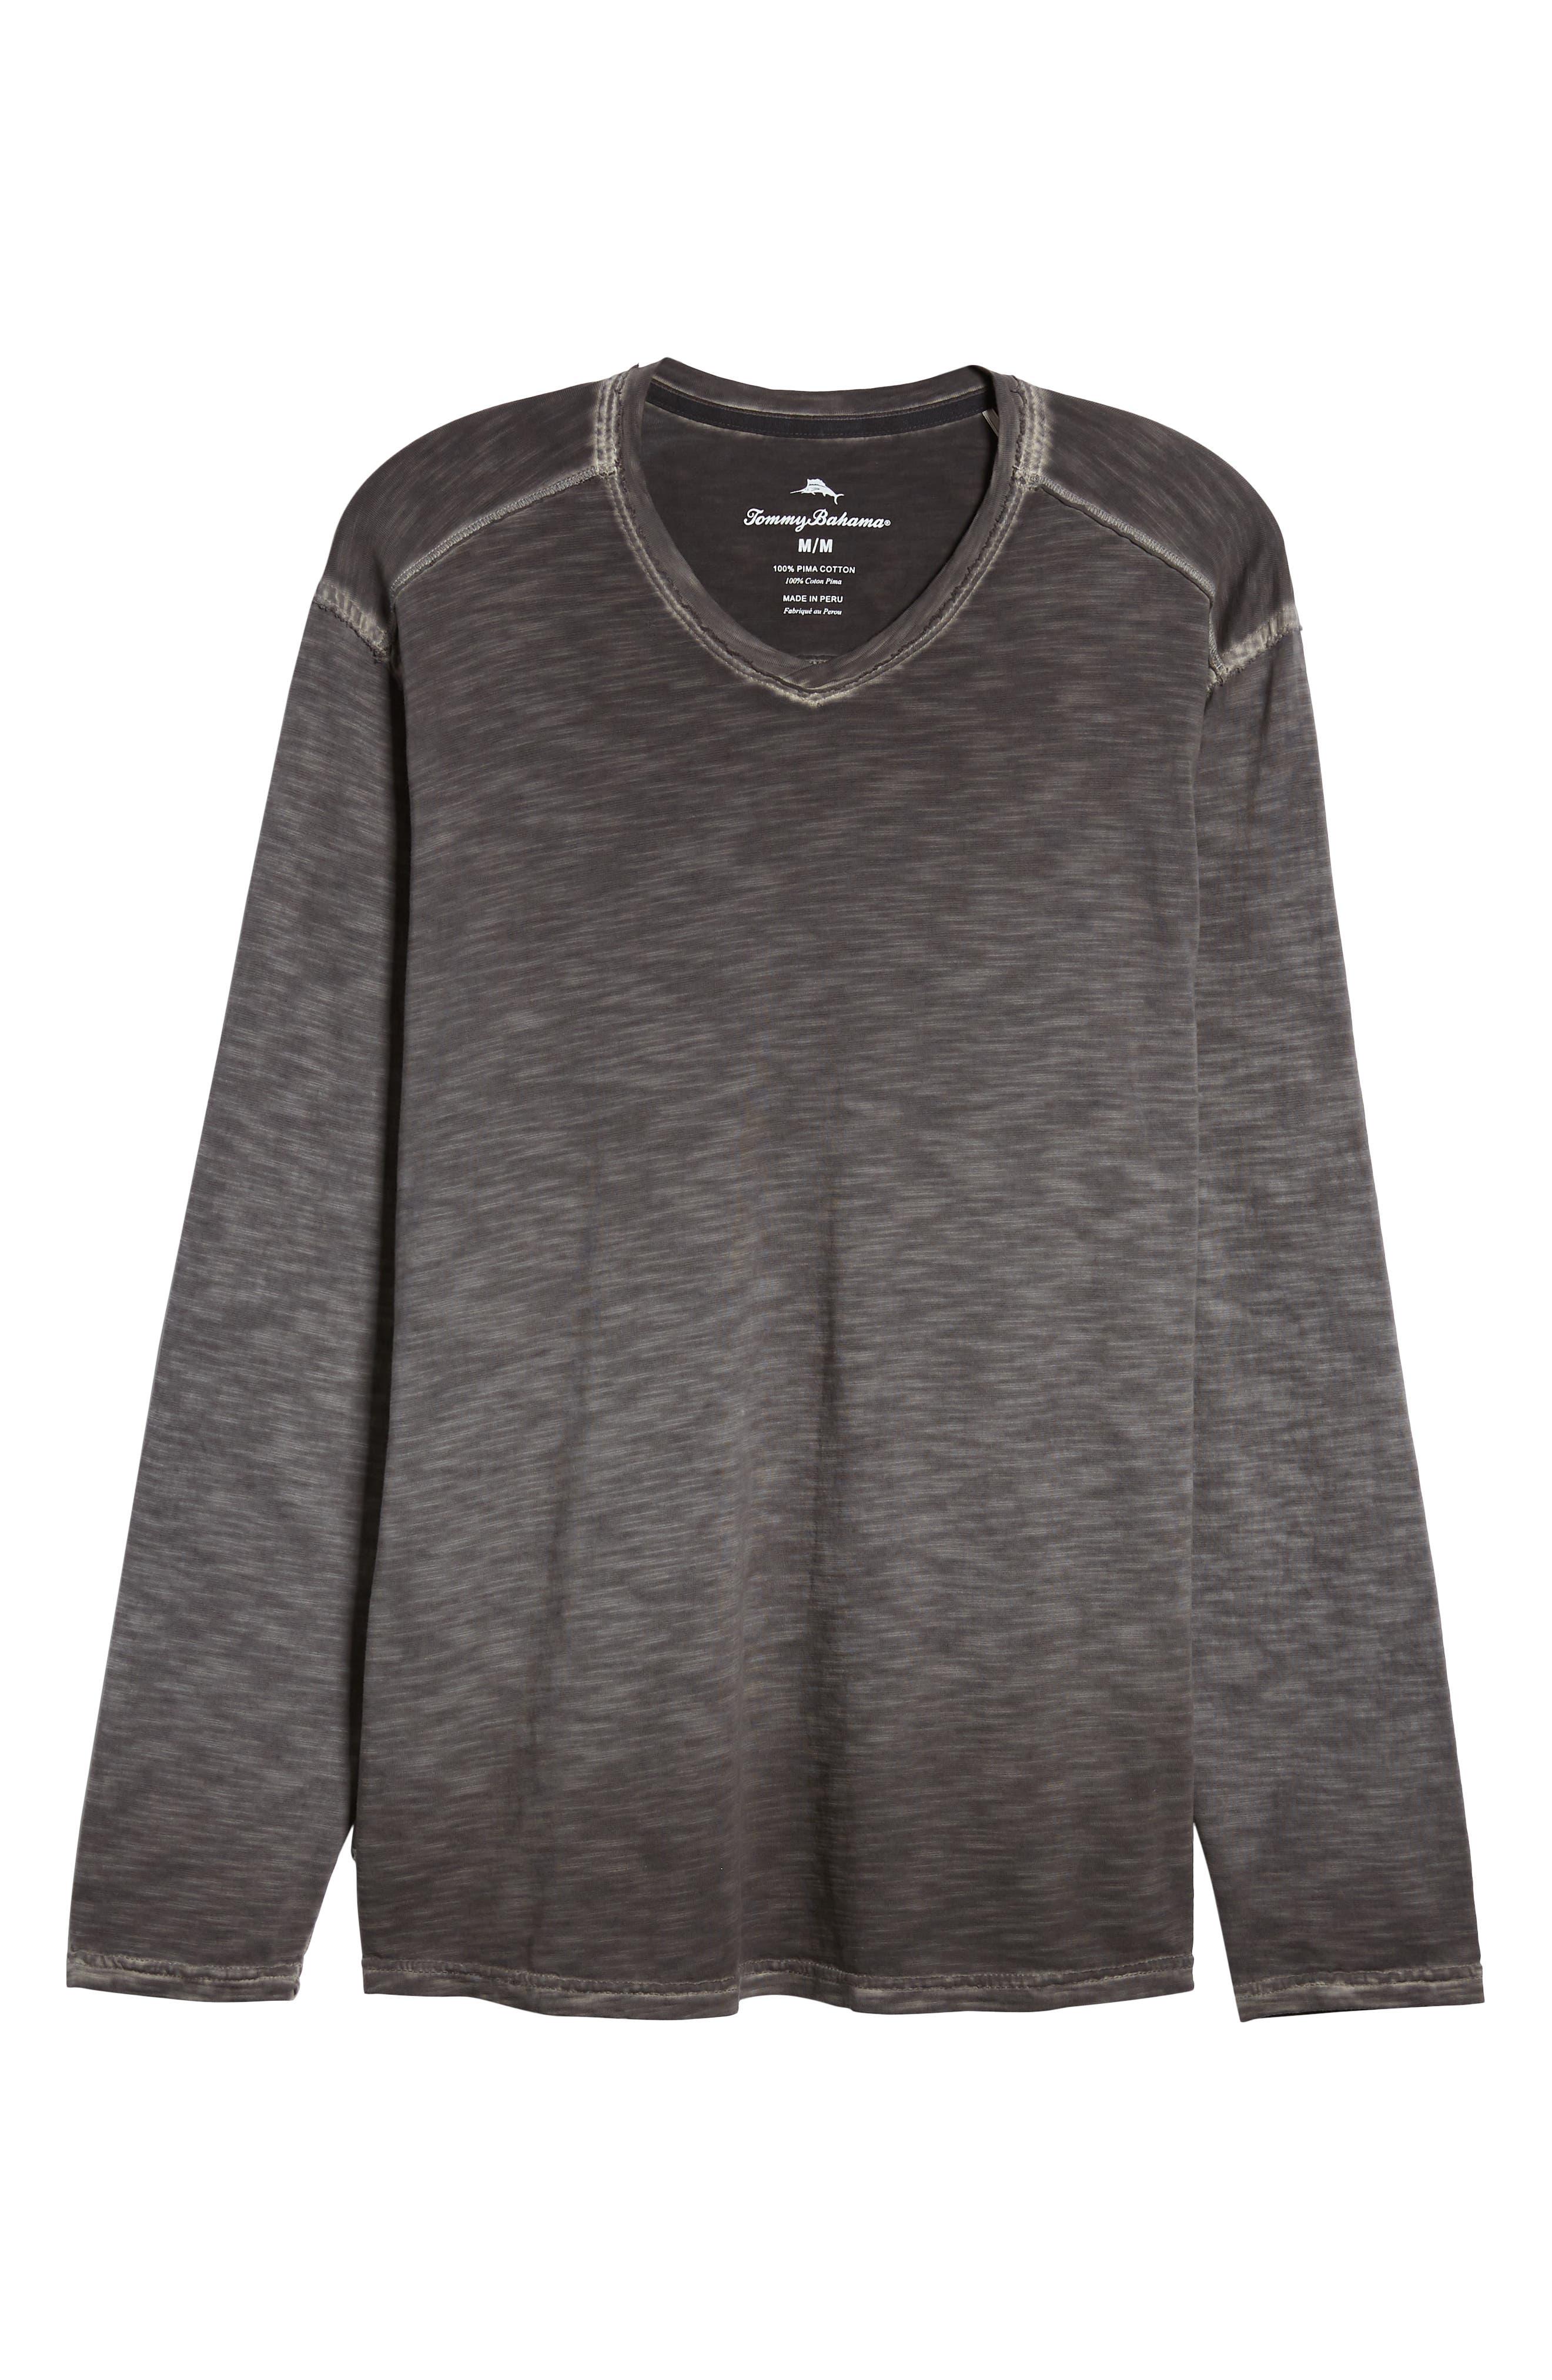 Suncoast Shores Long Sleeve V-Neck T-Shirt,                             Alternate thumbnail 6, color,                             COAL